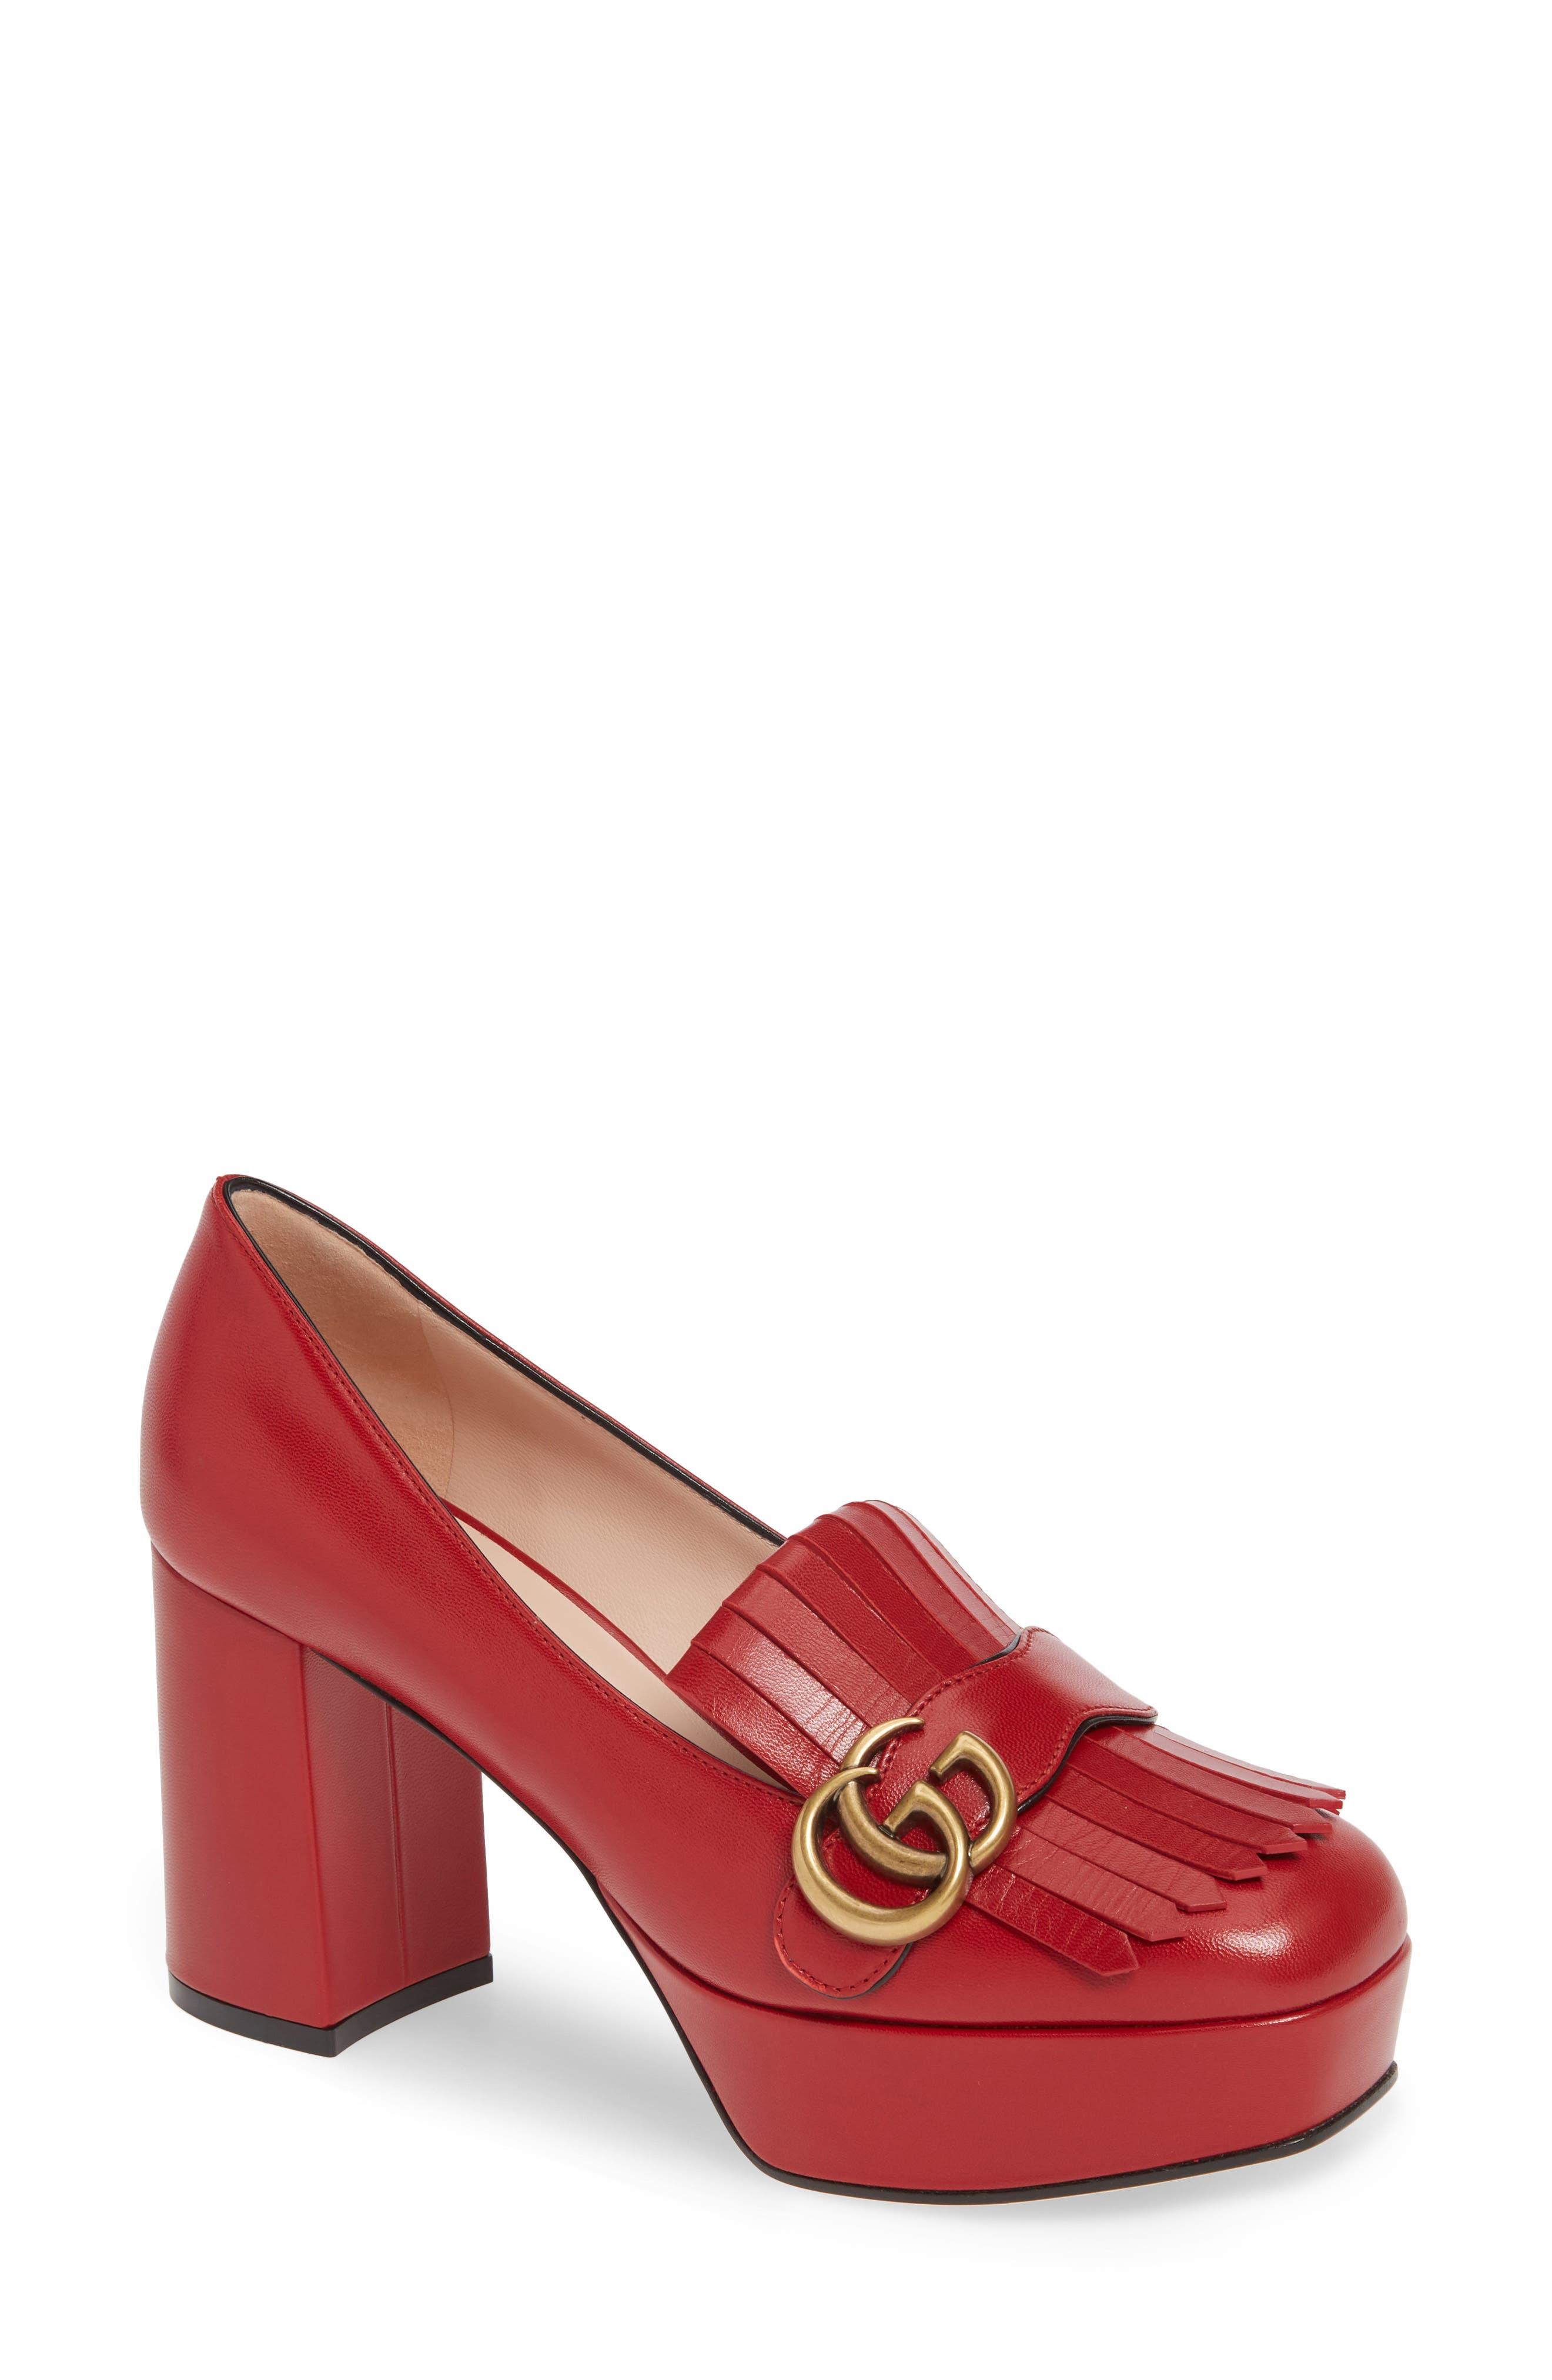 Gucci Marmont Kiltie Fringe Platform Pump, Red